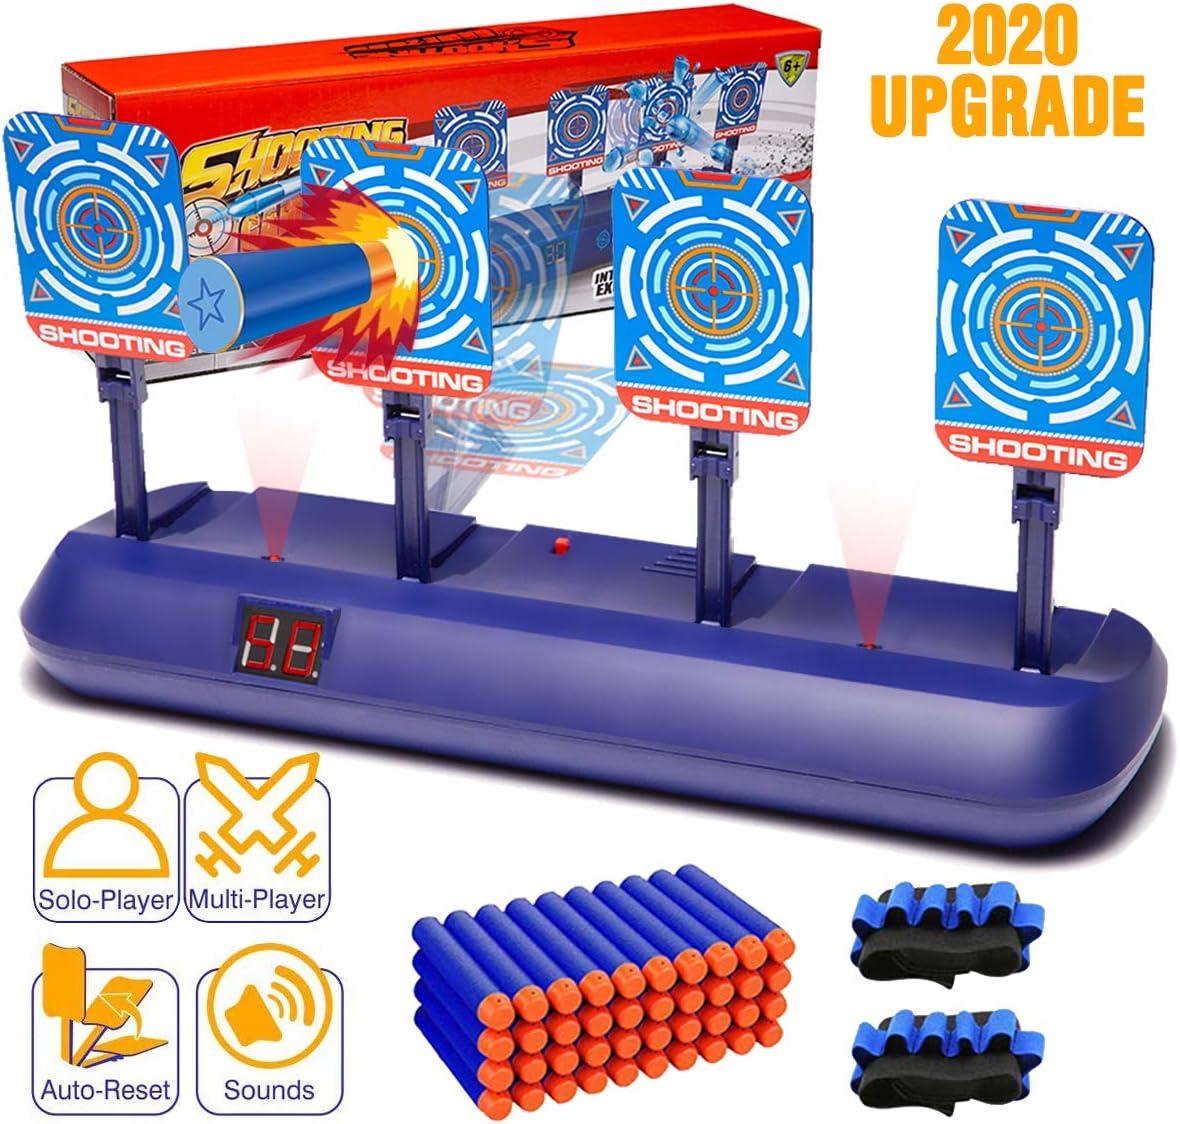 Snorain Gun Targets, Electronic Scoring Auto Reset Shooting Digital Target for Nerf Guns Toys , Ideal Christmas Gift Toy for Kids, Teens, Boys & Girls